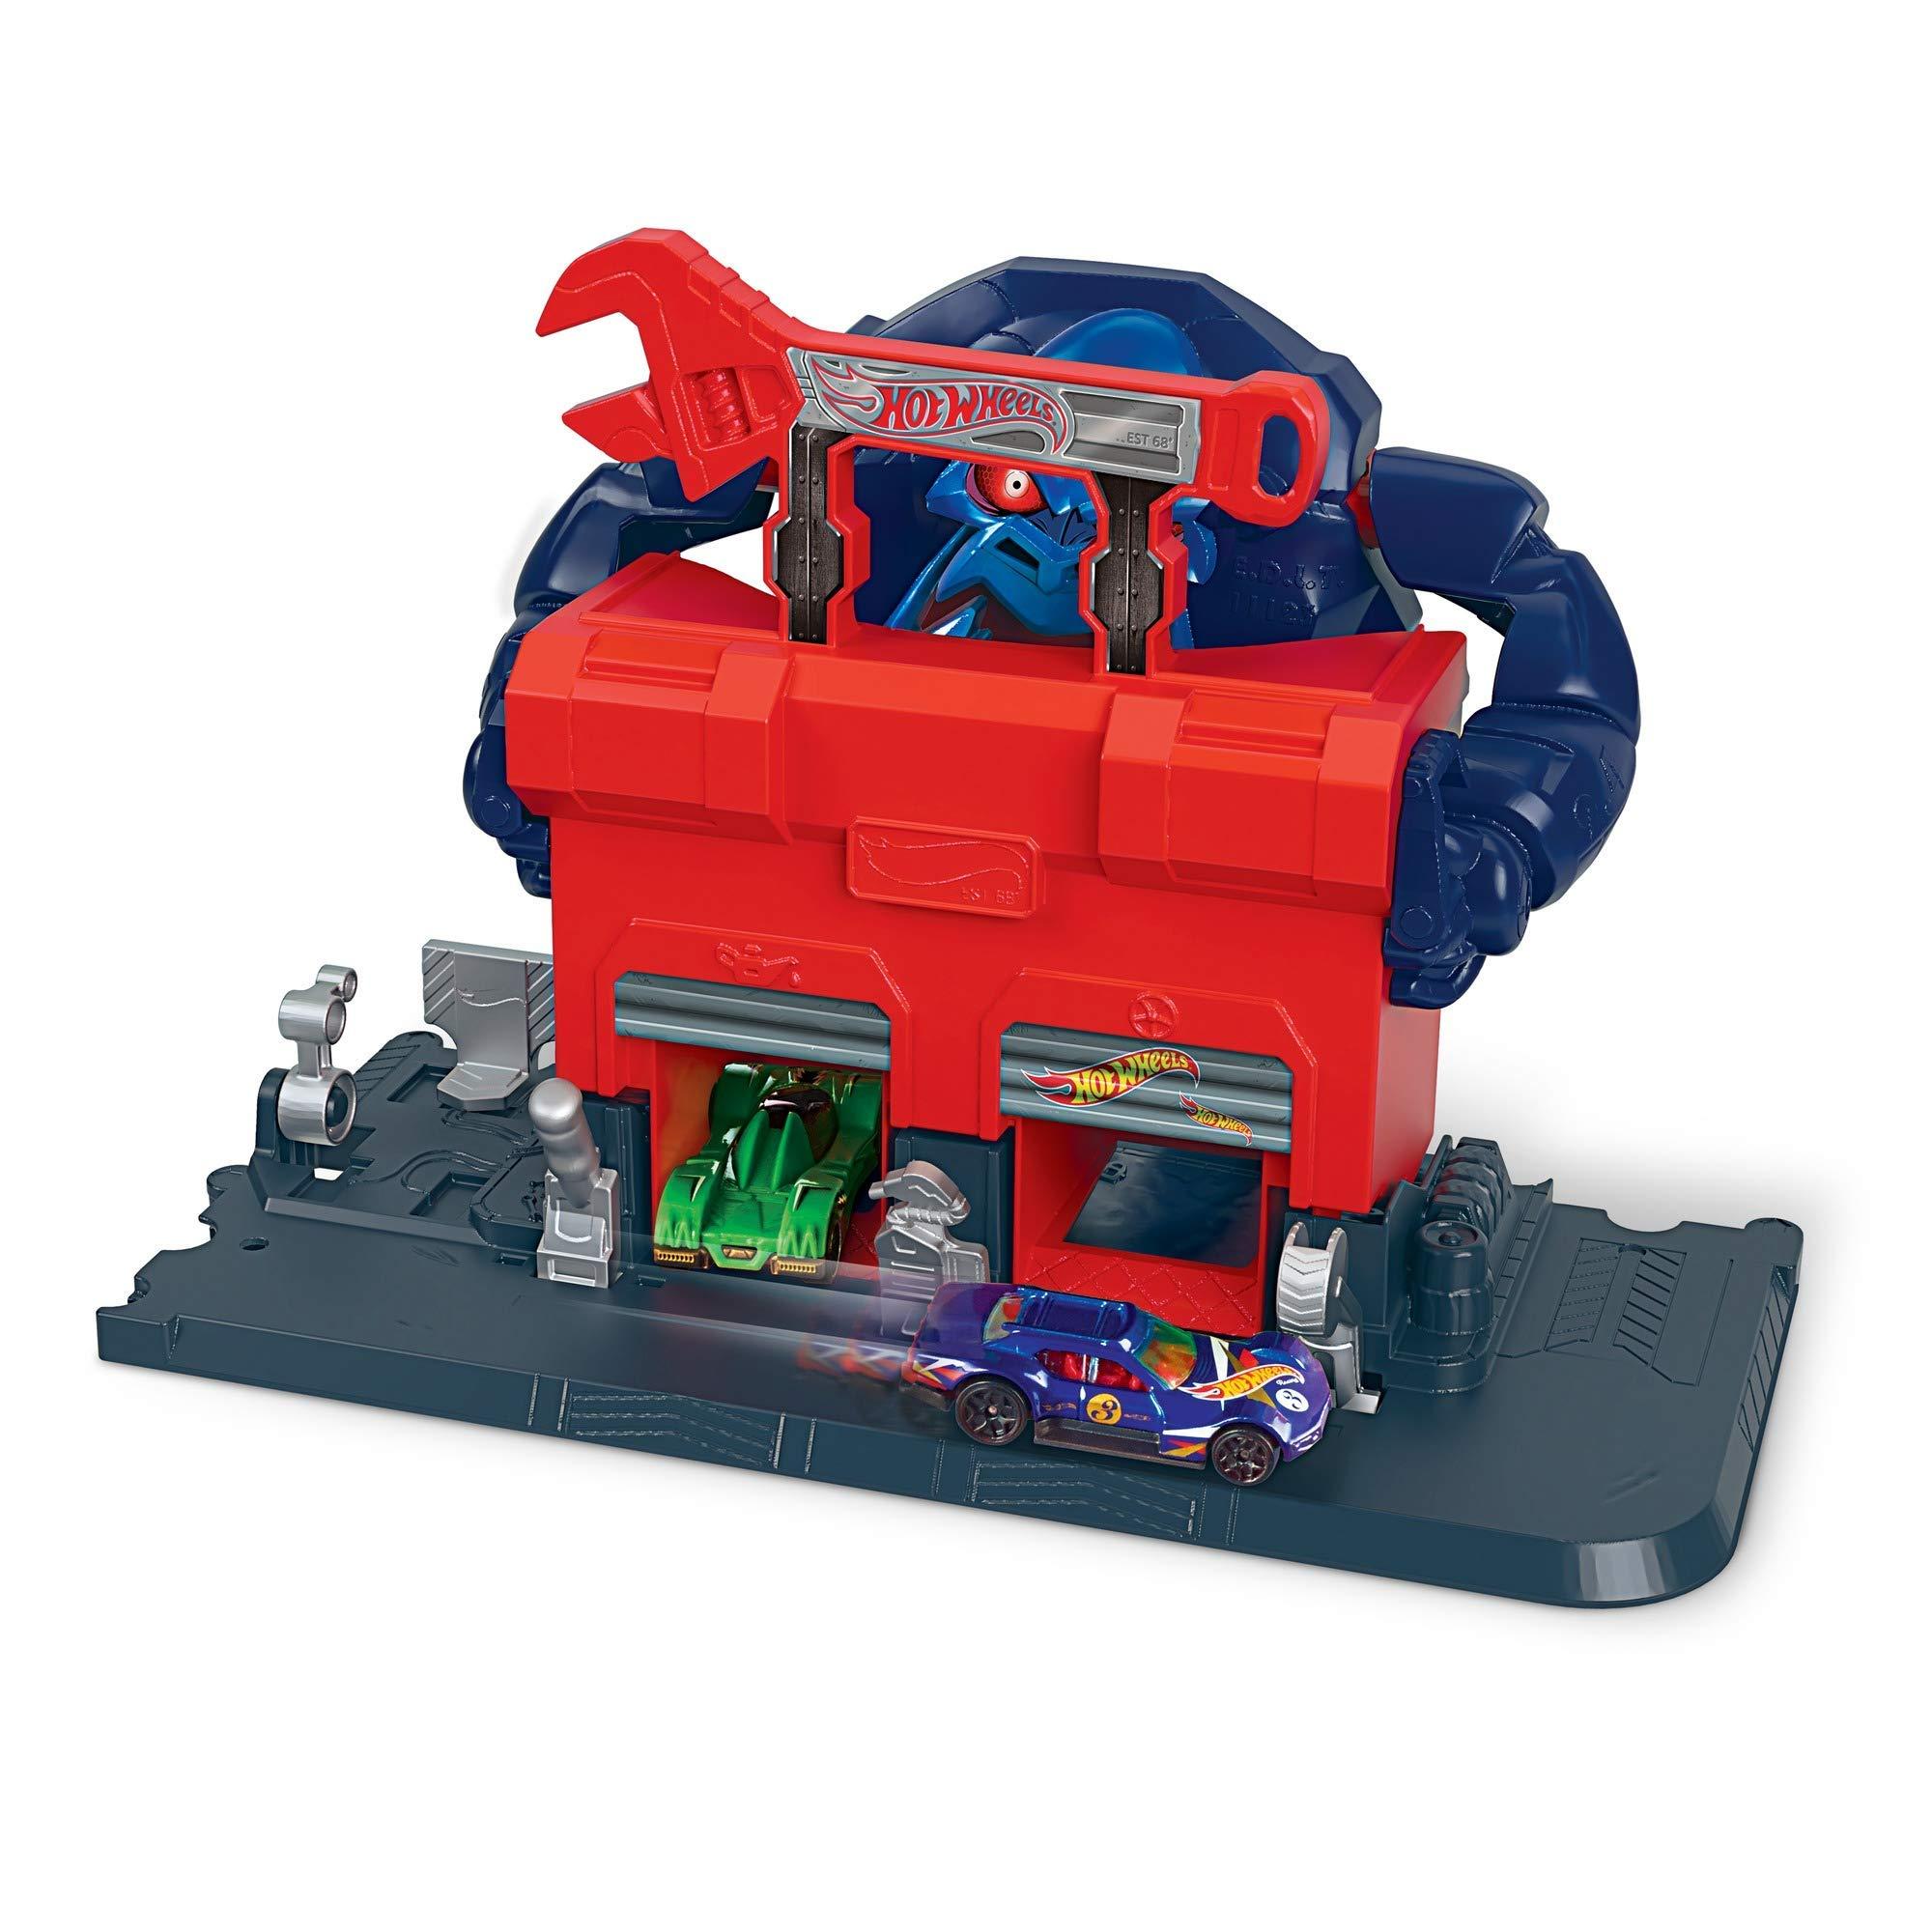 Multi-Colour Hot Wheels FNB06 City Gator Garage Attack Play Set